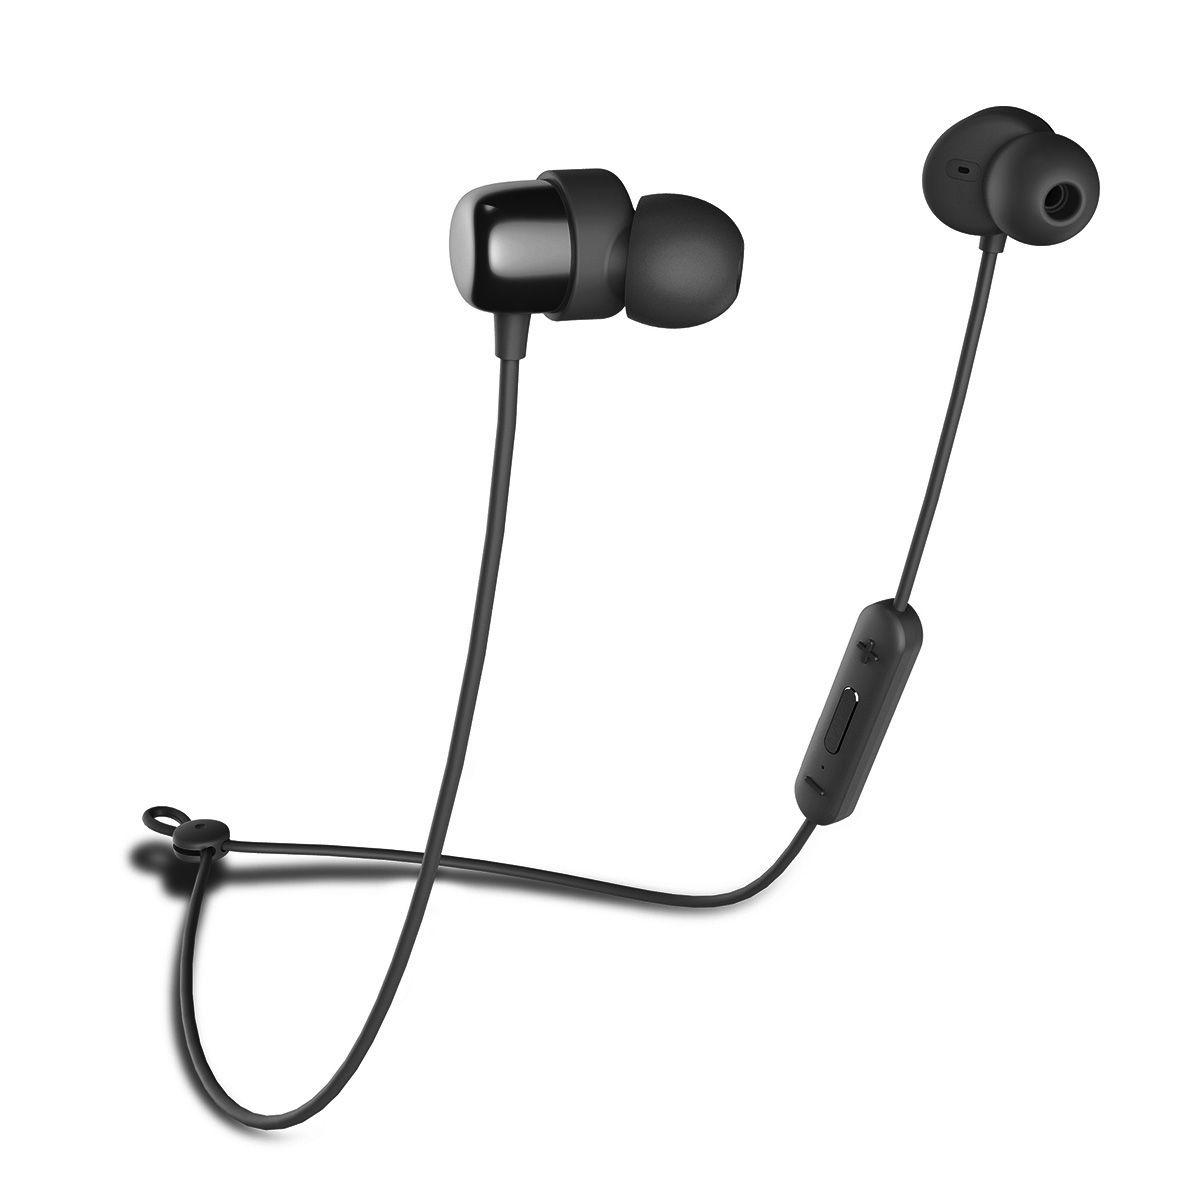 Bluetooth sluchátka NICEBOY Hive E2, černá